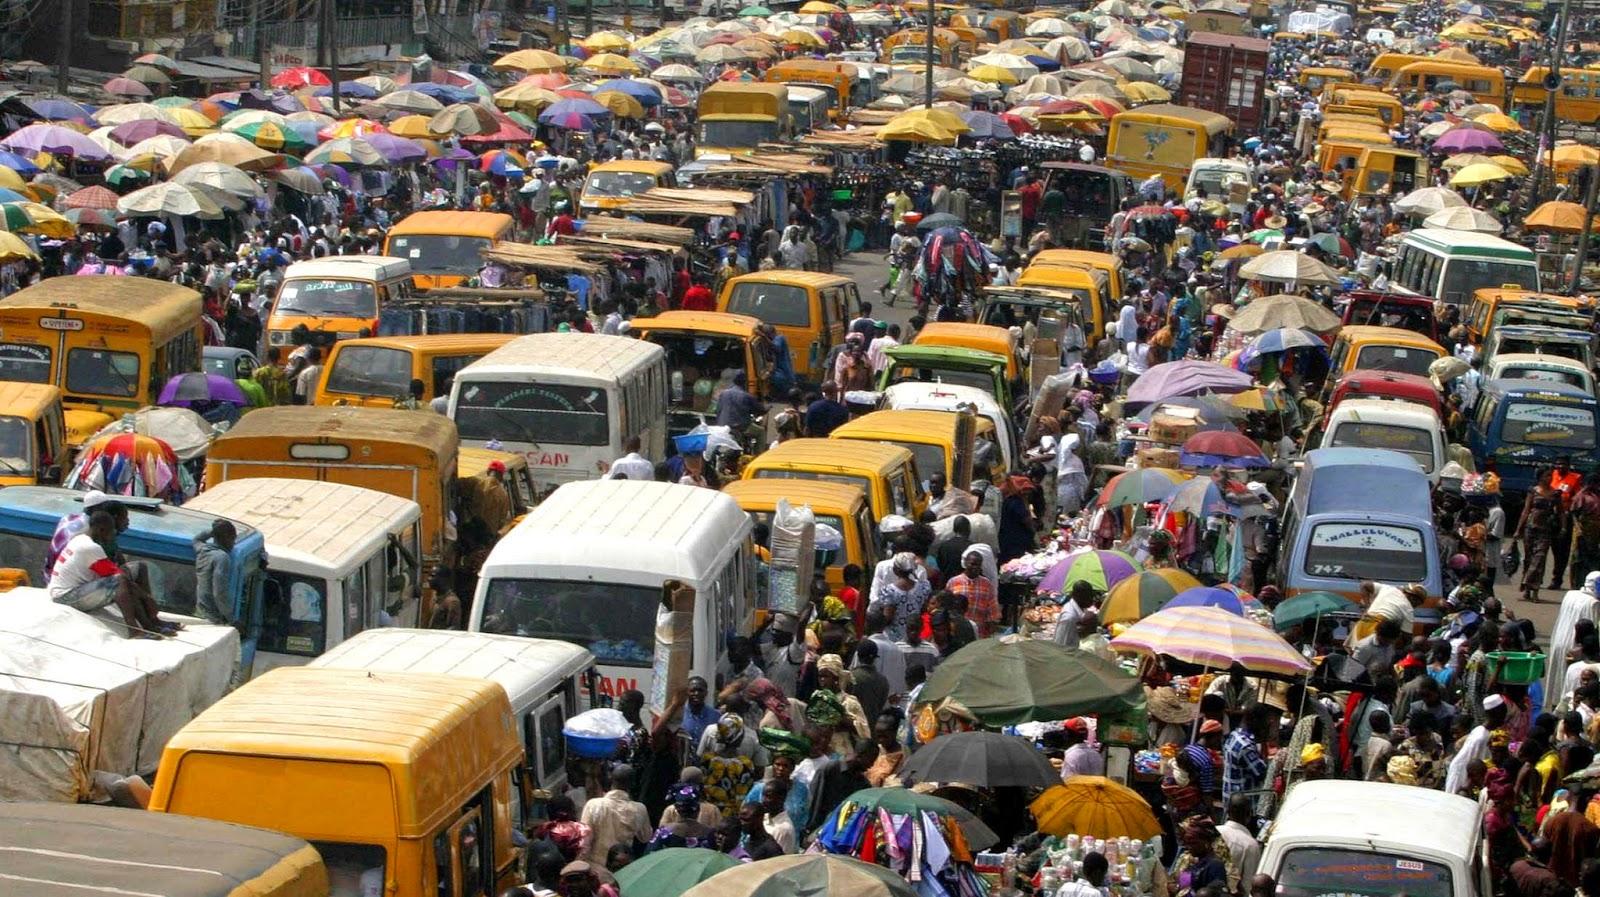 traffic jam in lagos state nigeria The secretariat, obafemi awolowo way, ikeja, lagos state, nigeria email:info@lagosstategovng.